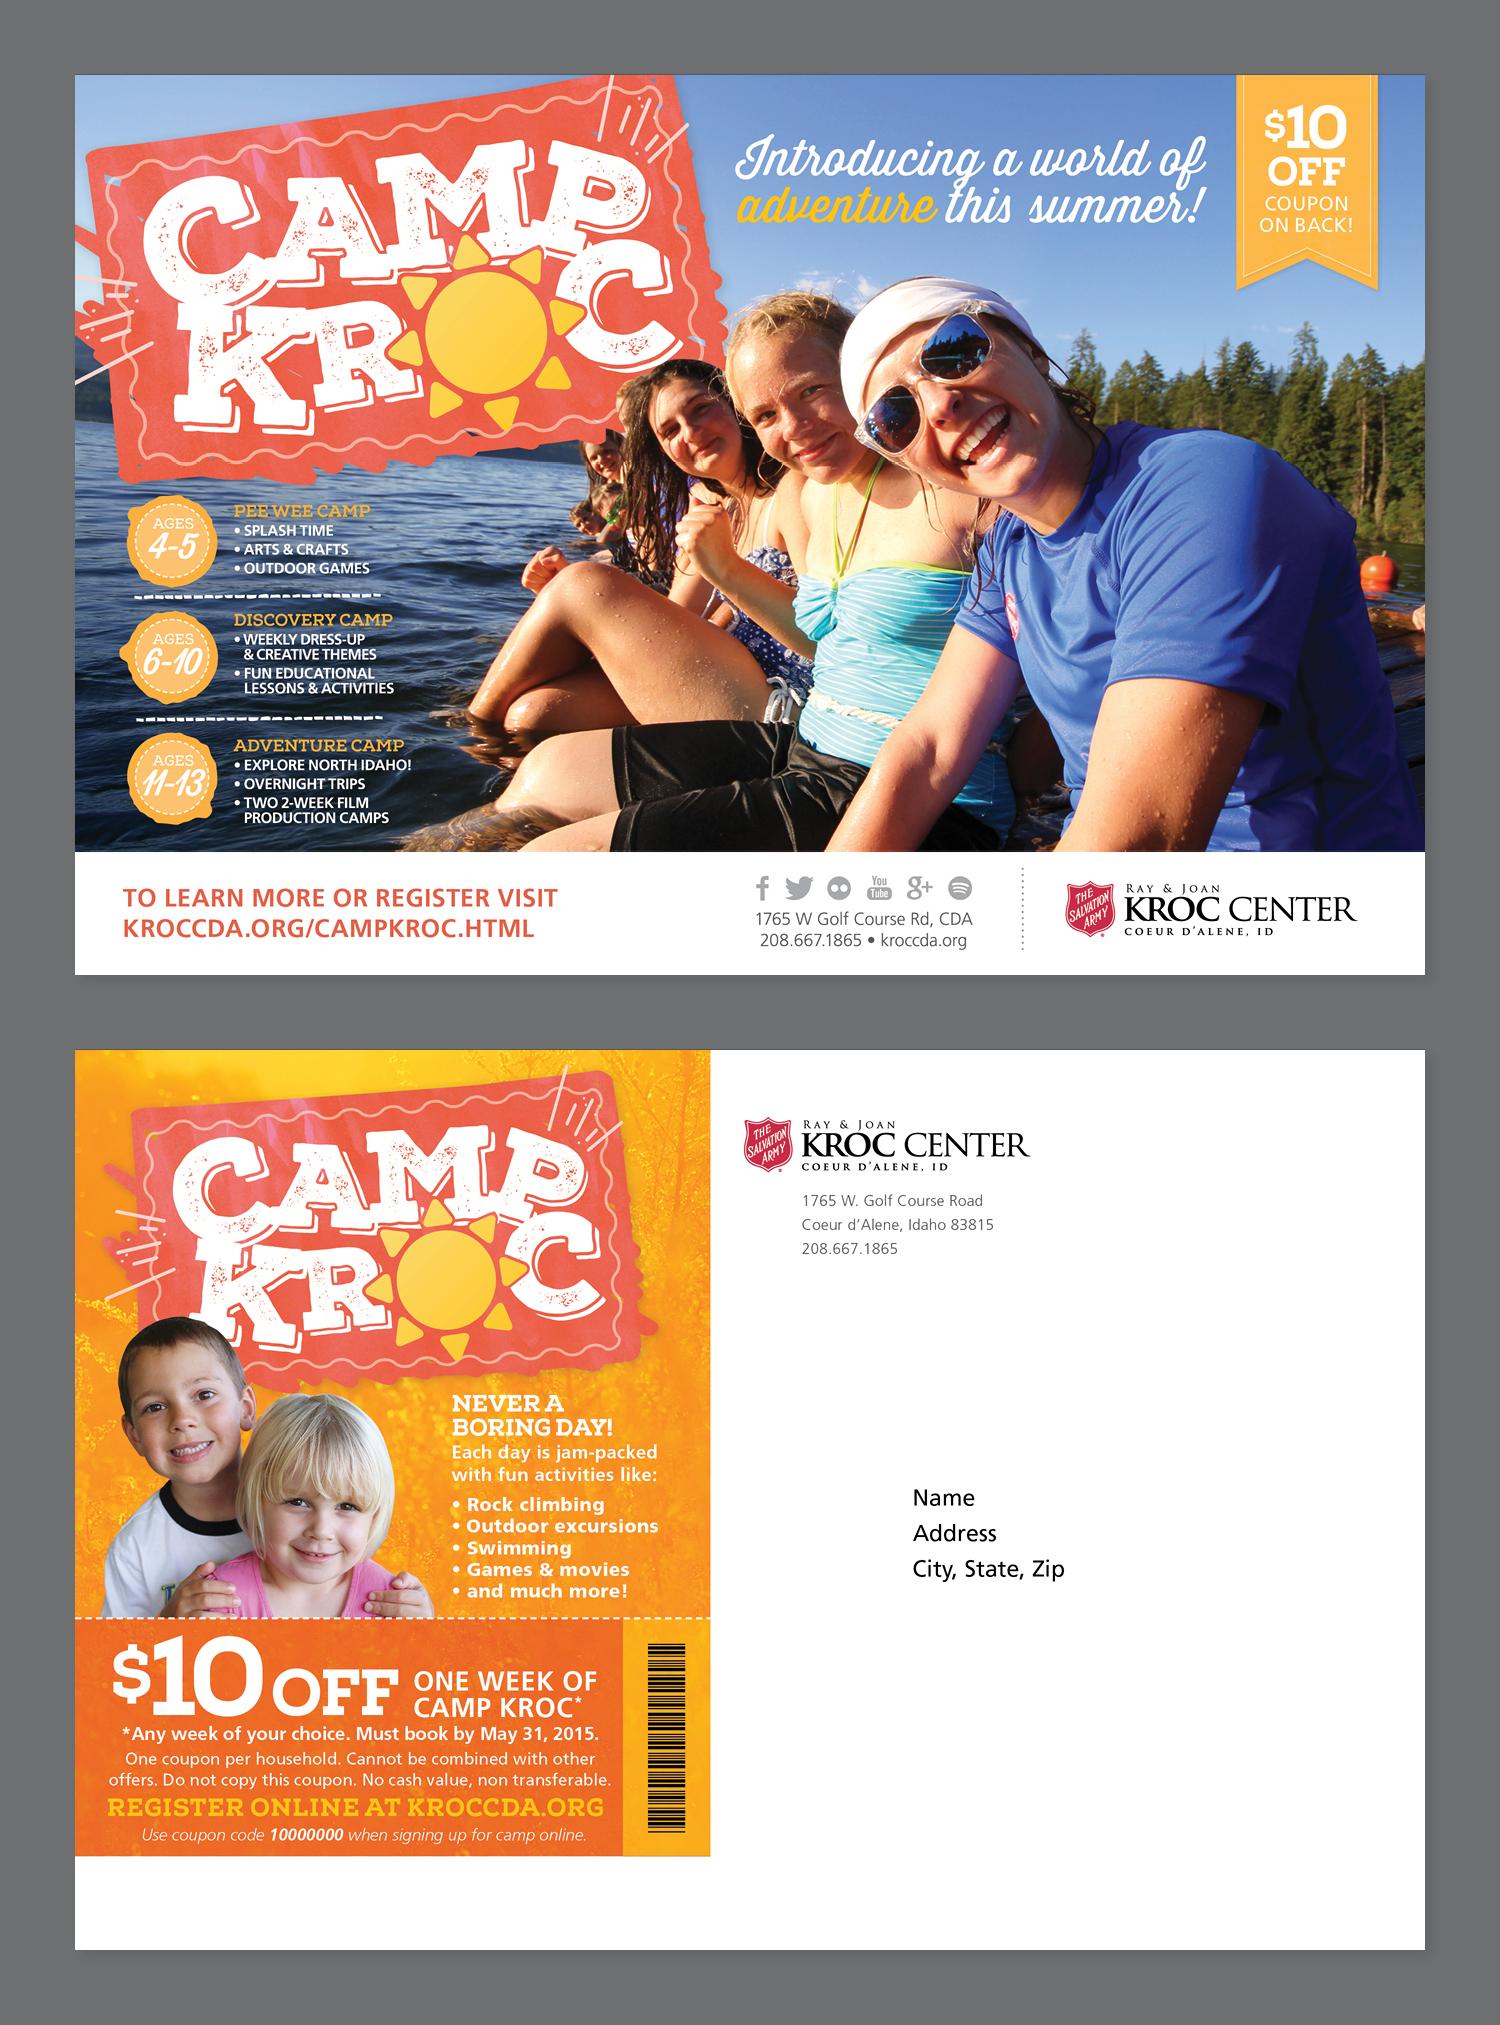 camp_kroc_4.jpg